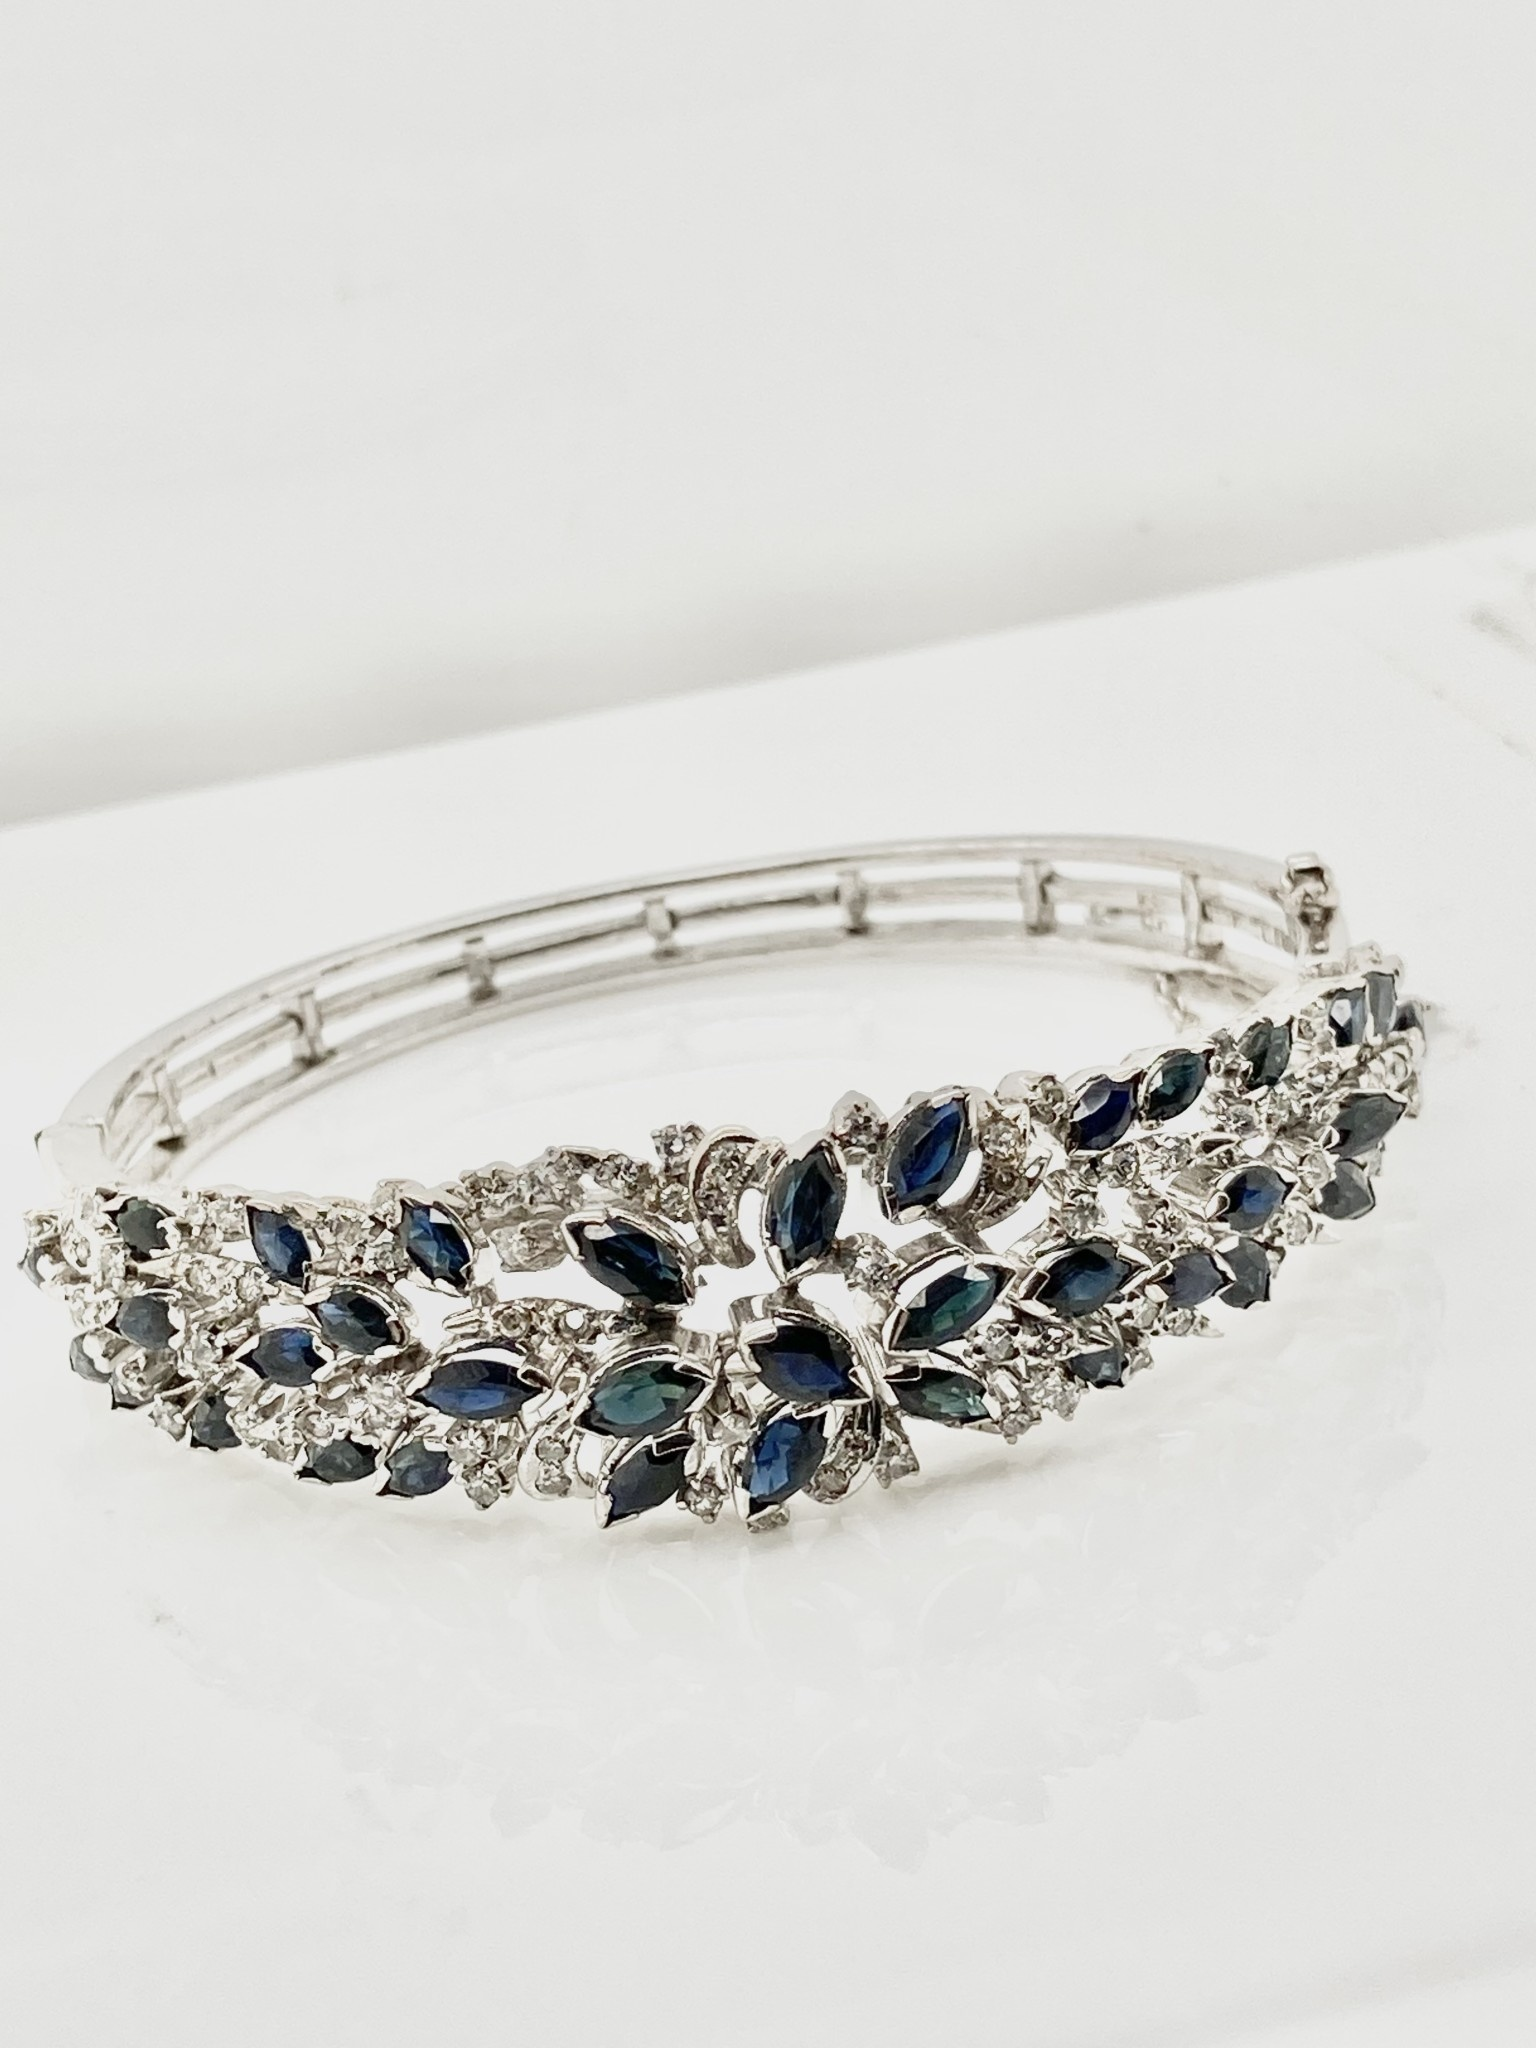 Diamond & Blue Sapphire Hinged Bangle Bracelet